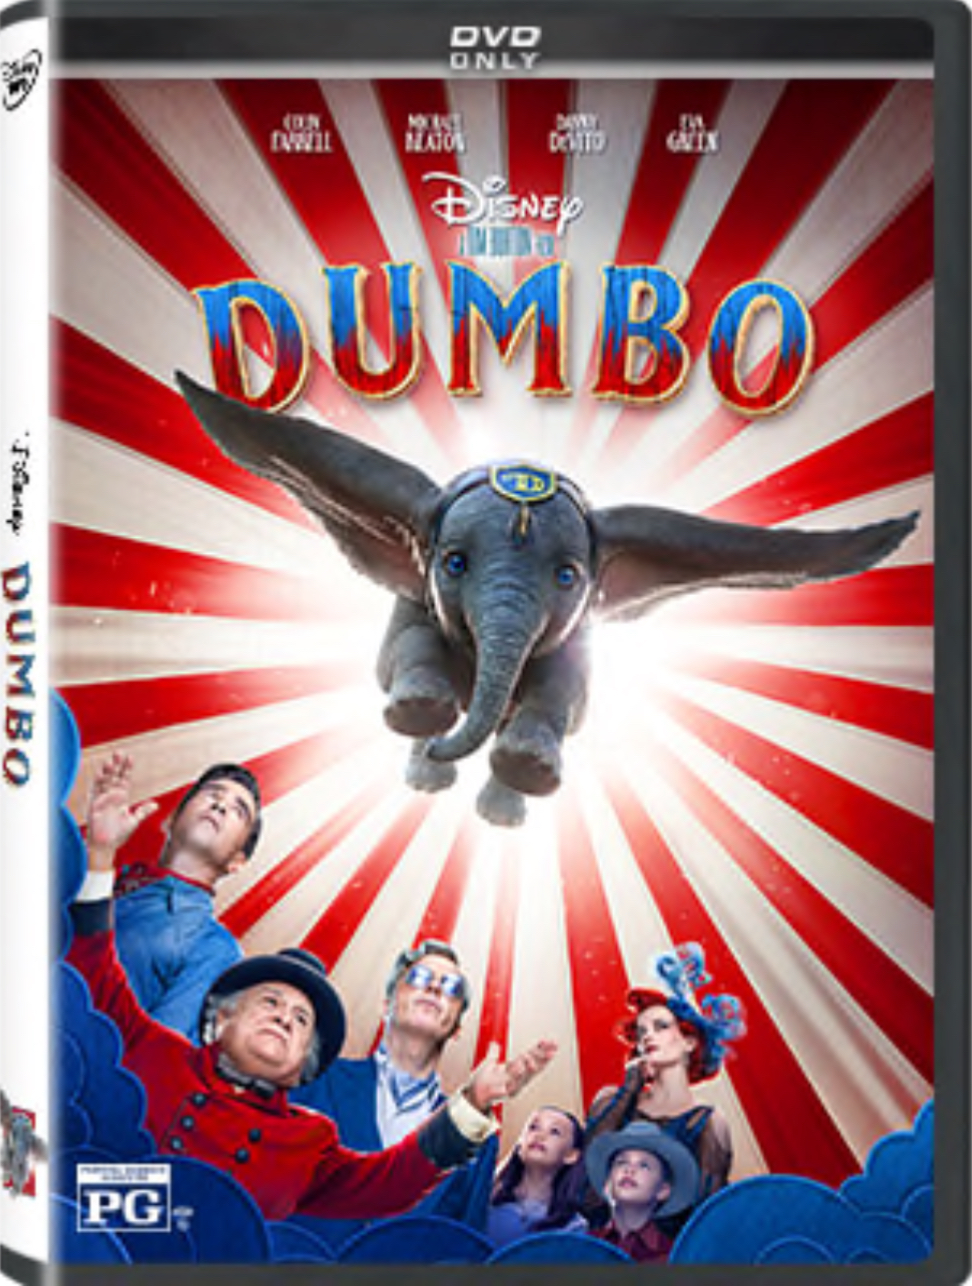 Dumbo (2019 video)